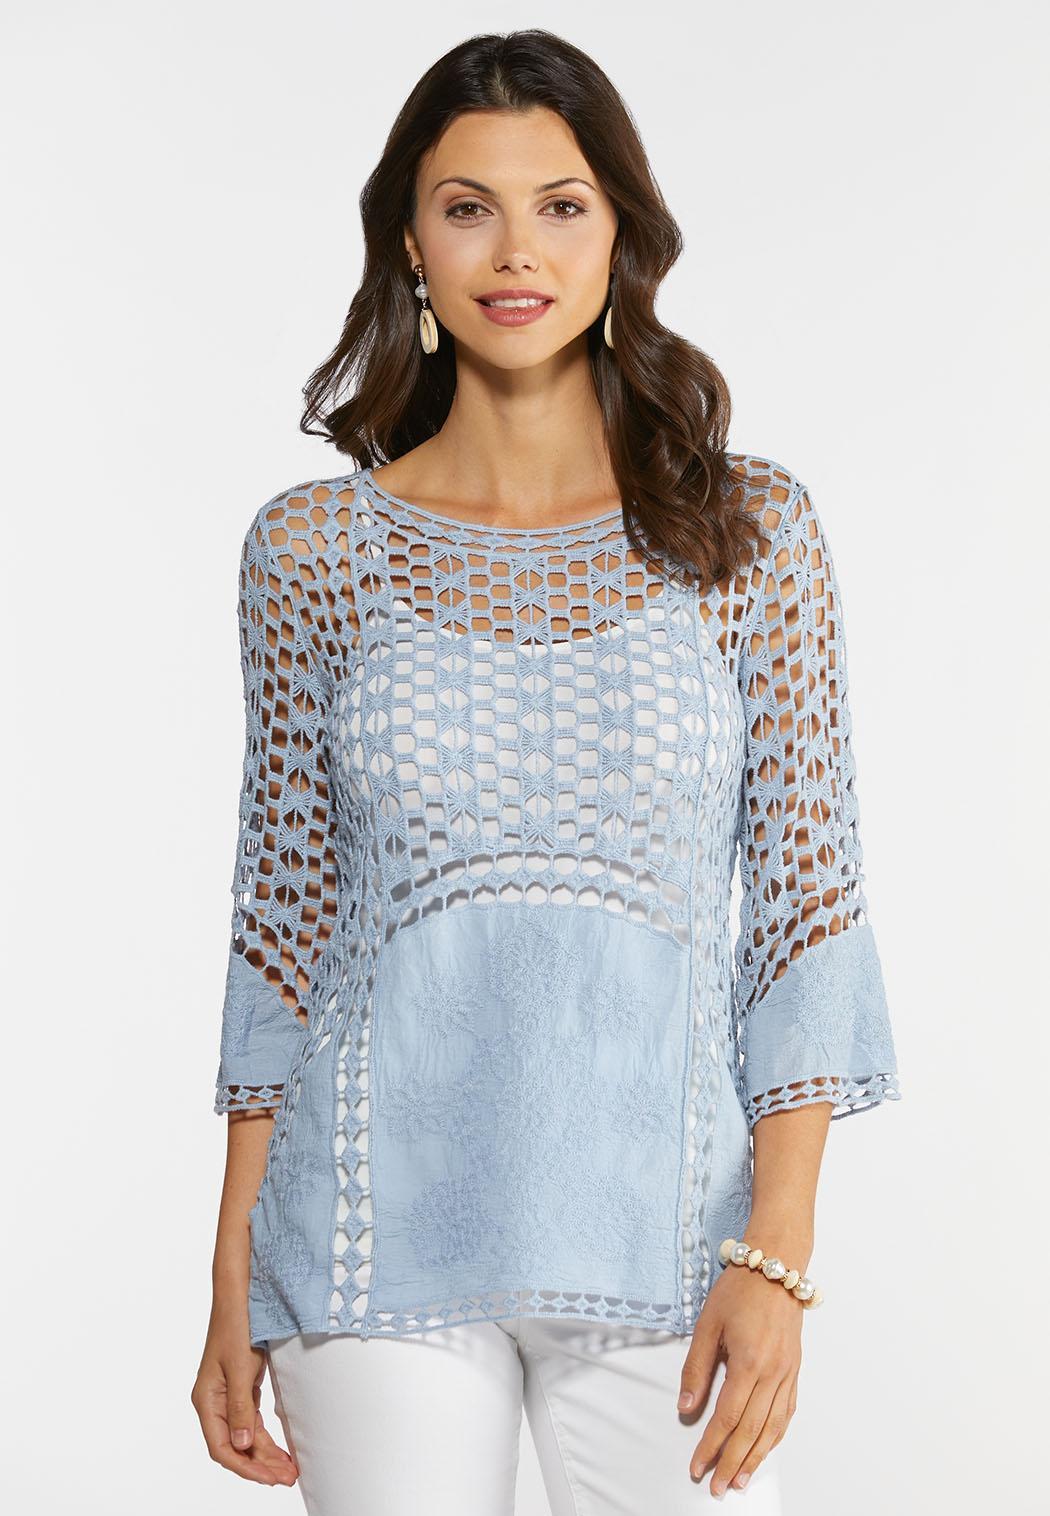 Crochet Slate Blue Top